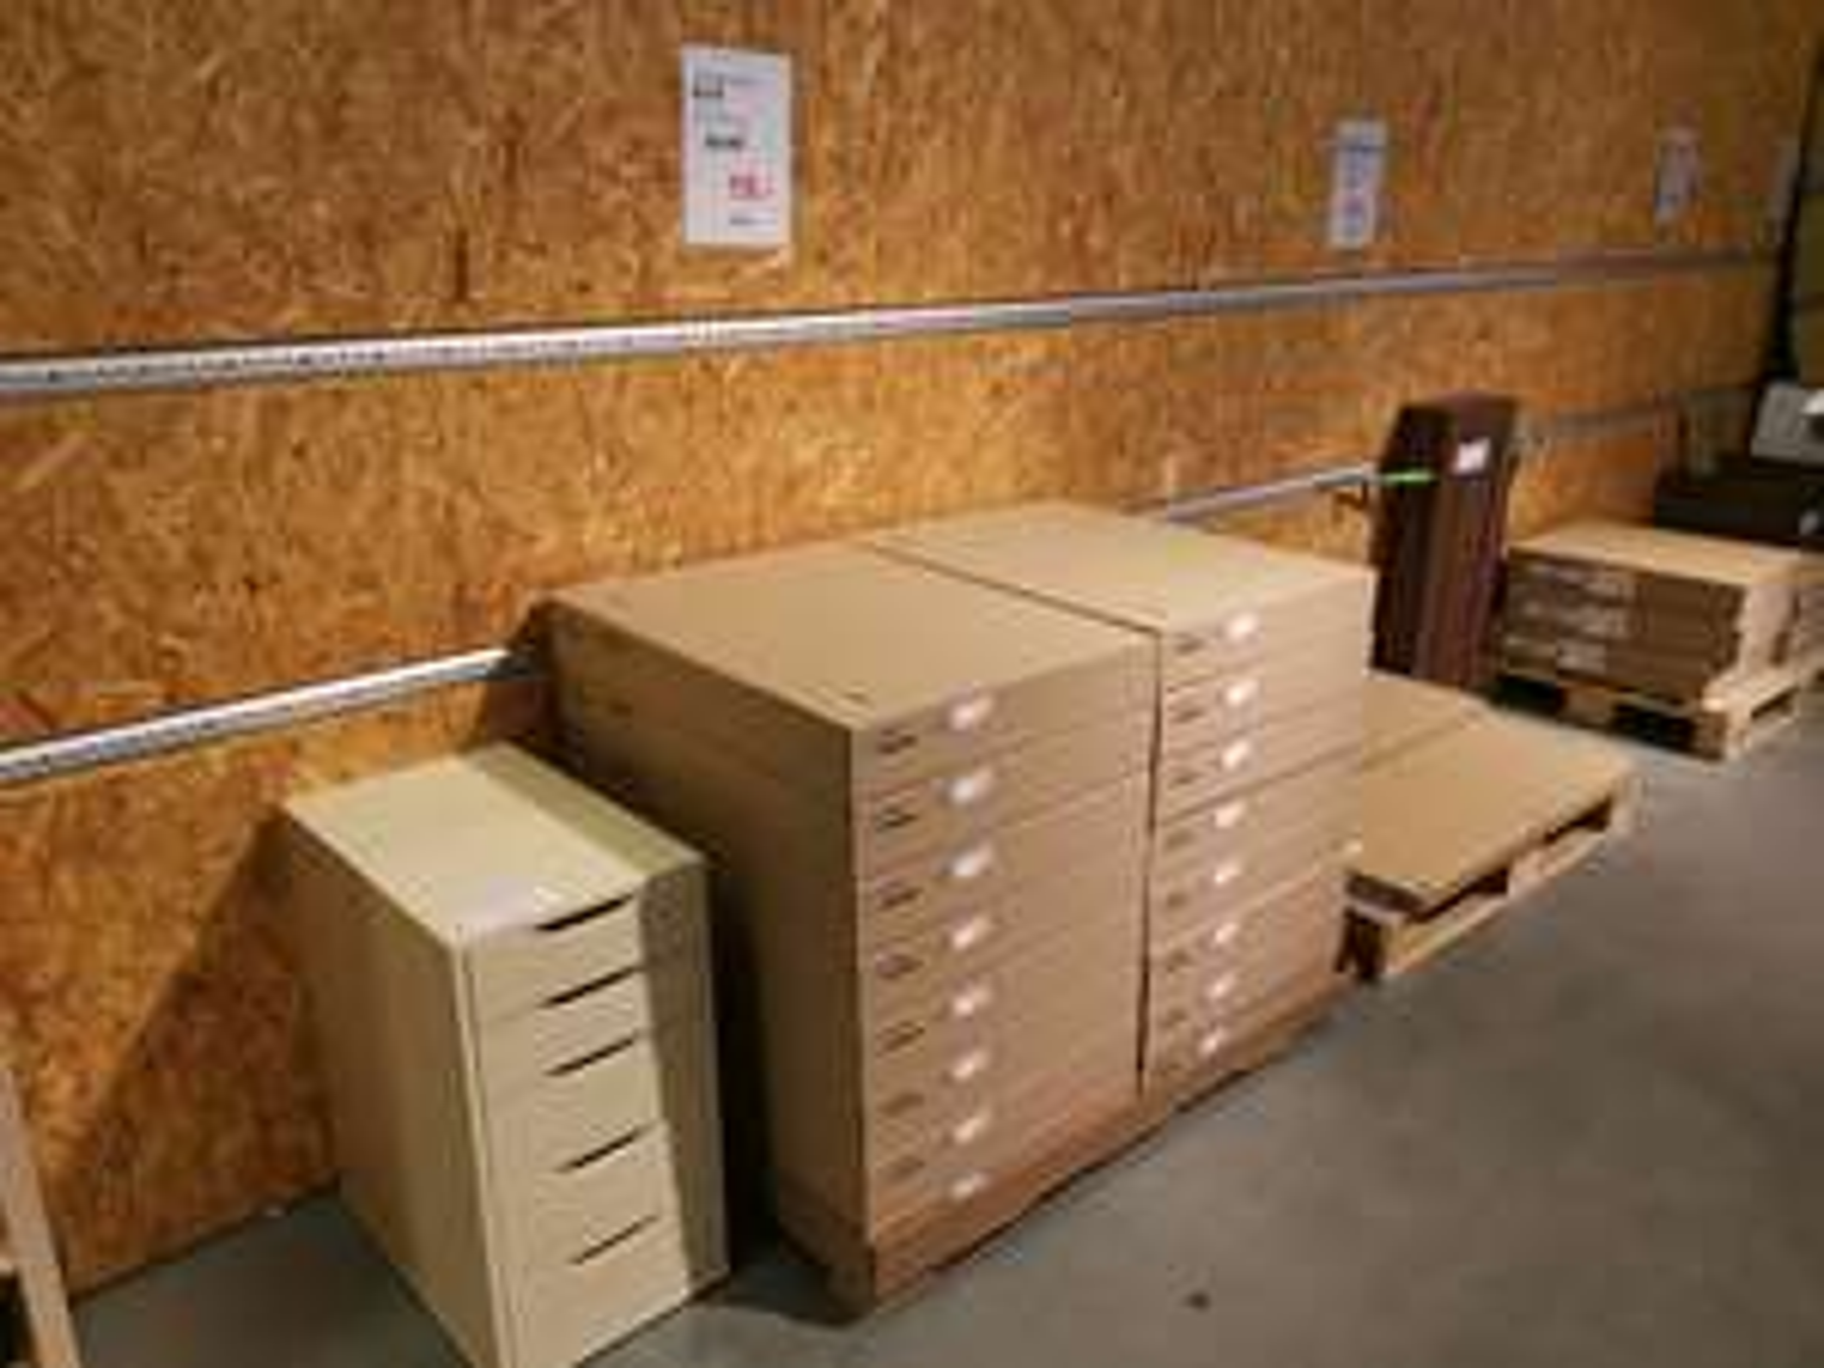 Lokal Ikea Alex Schubladenschrank birke Hamburg moorflet